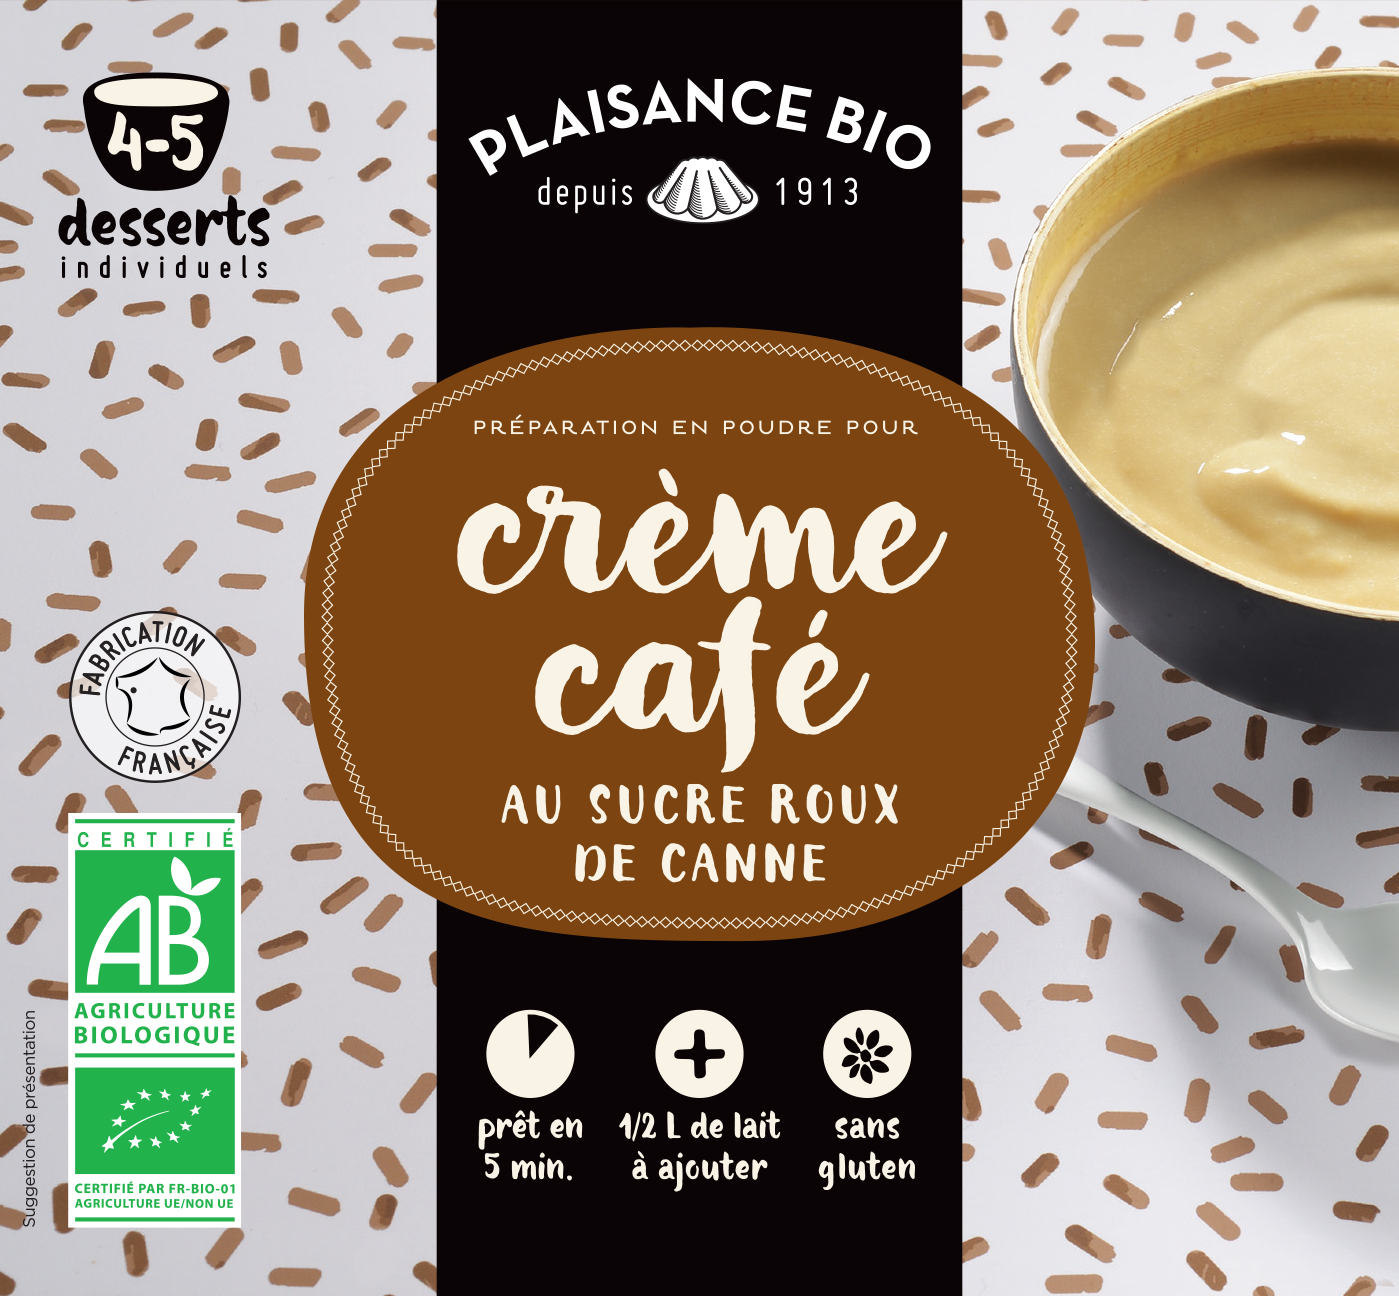 PLAISANCE BIO CREME CAFE